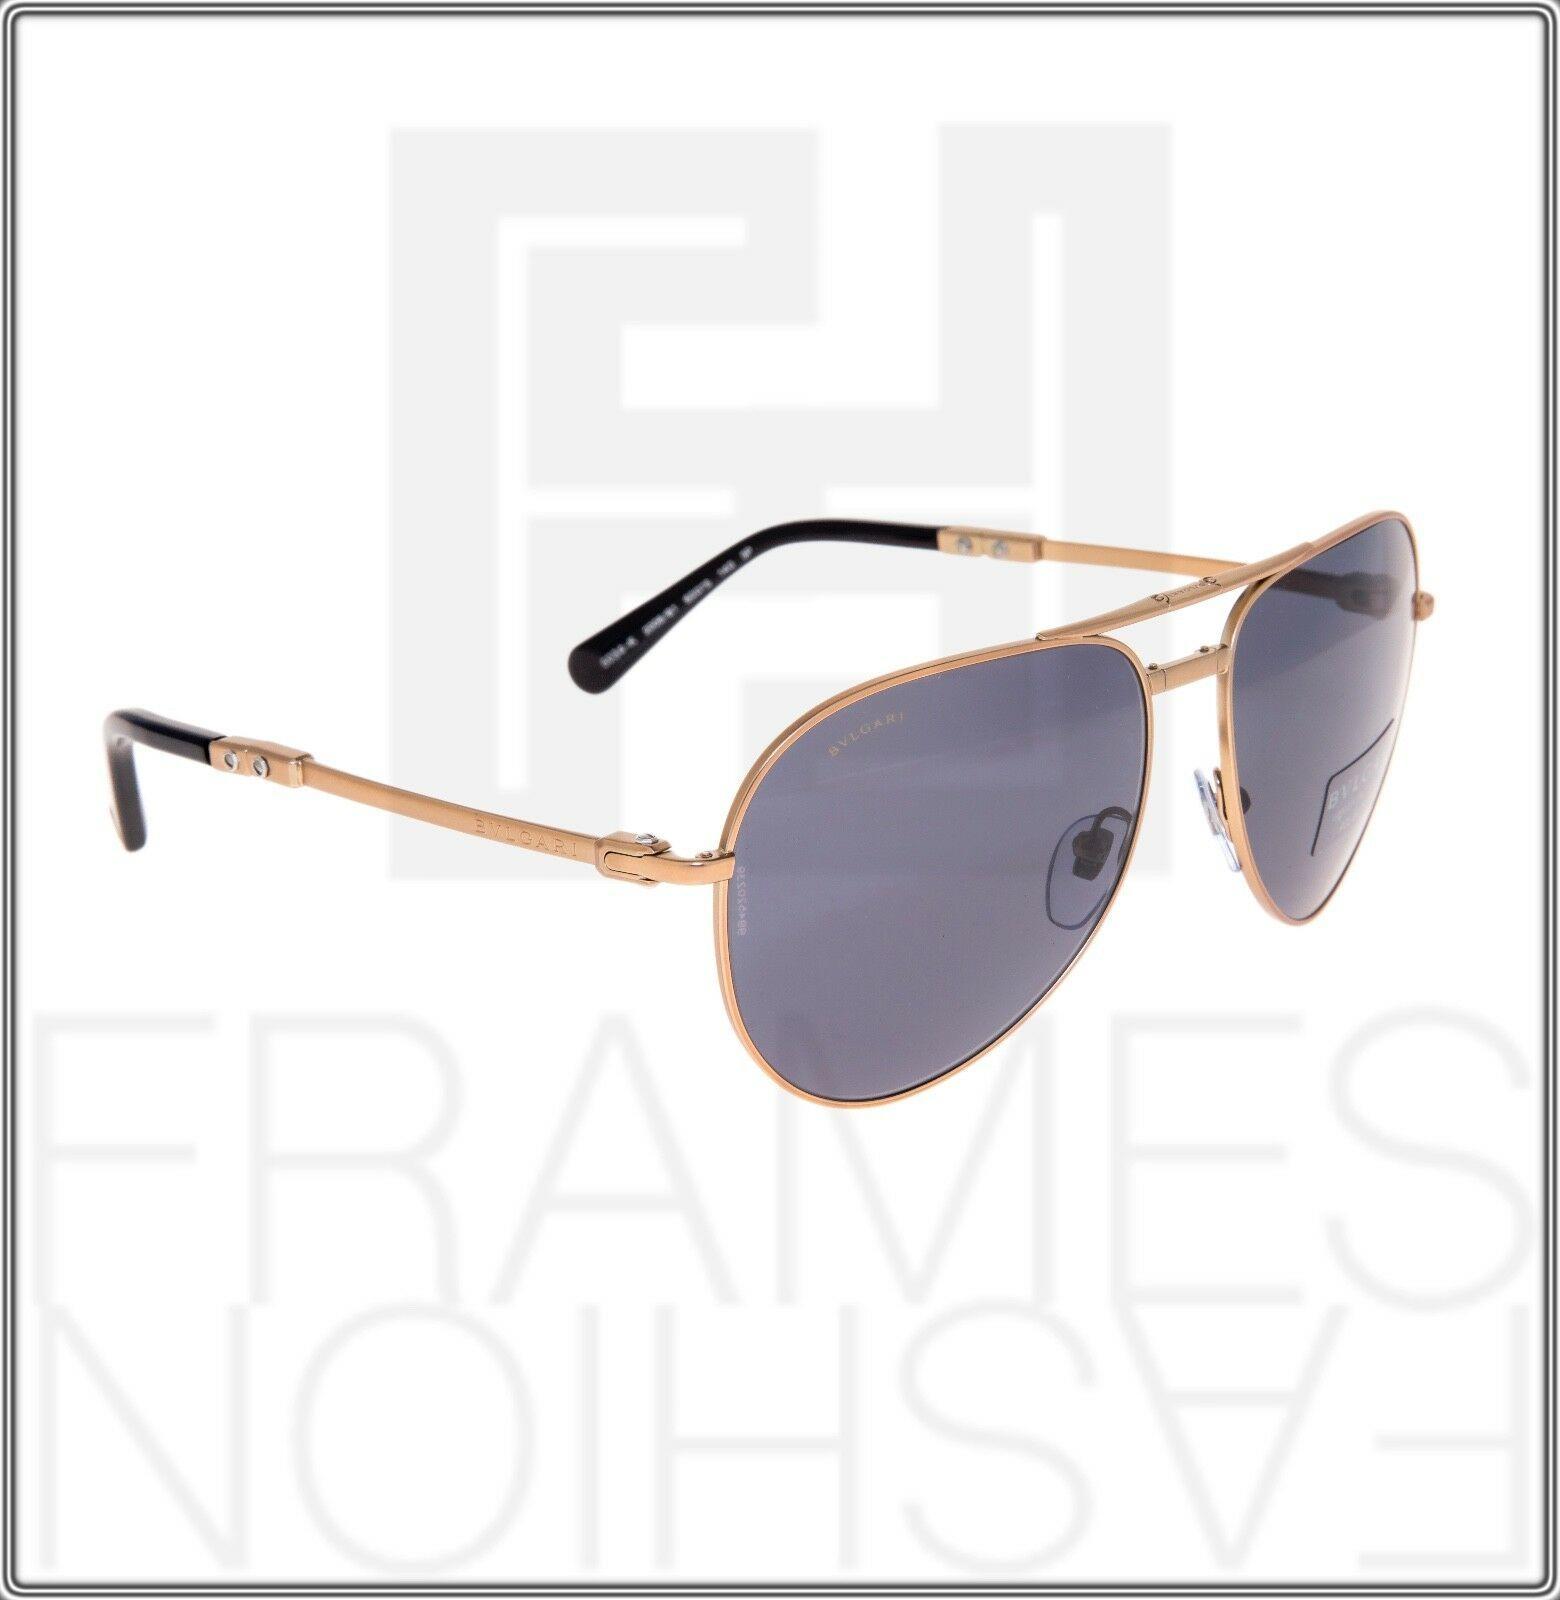 BVLGARI Le Gemme Black Rose Gold 18K Plated POLARIZED Foldable Sunglasses 5034 image 5